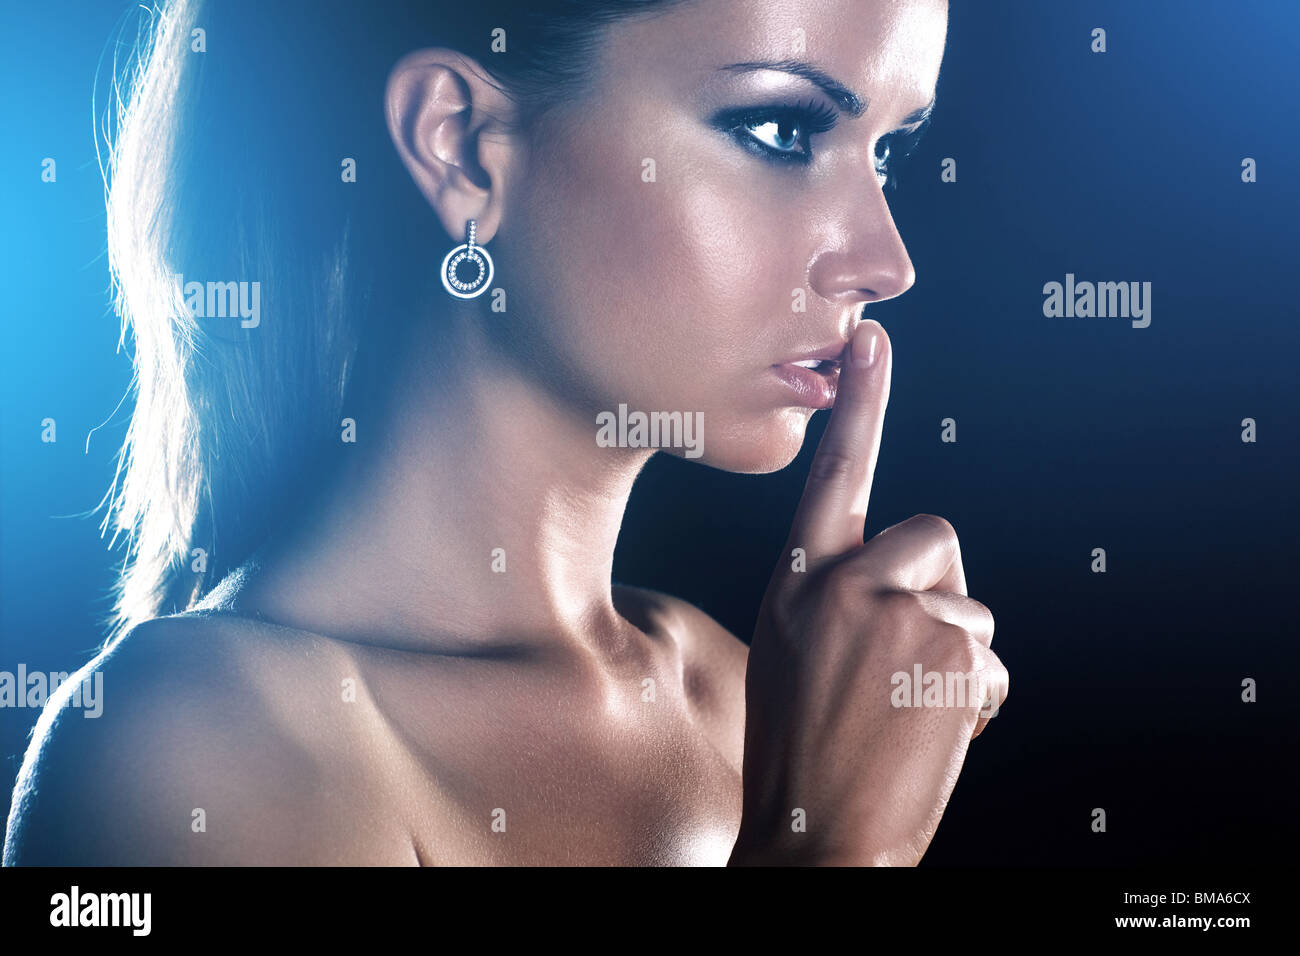 Mujer joven mostrando handsign tranquila. Sobre un fondo oscuro. Imagen De Stock